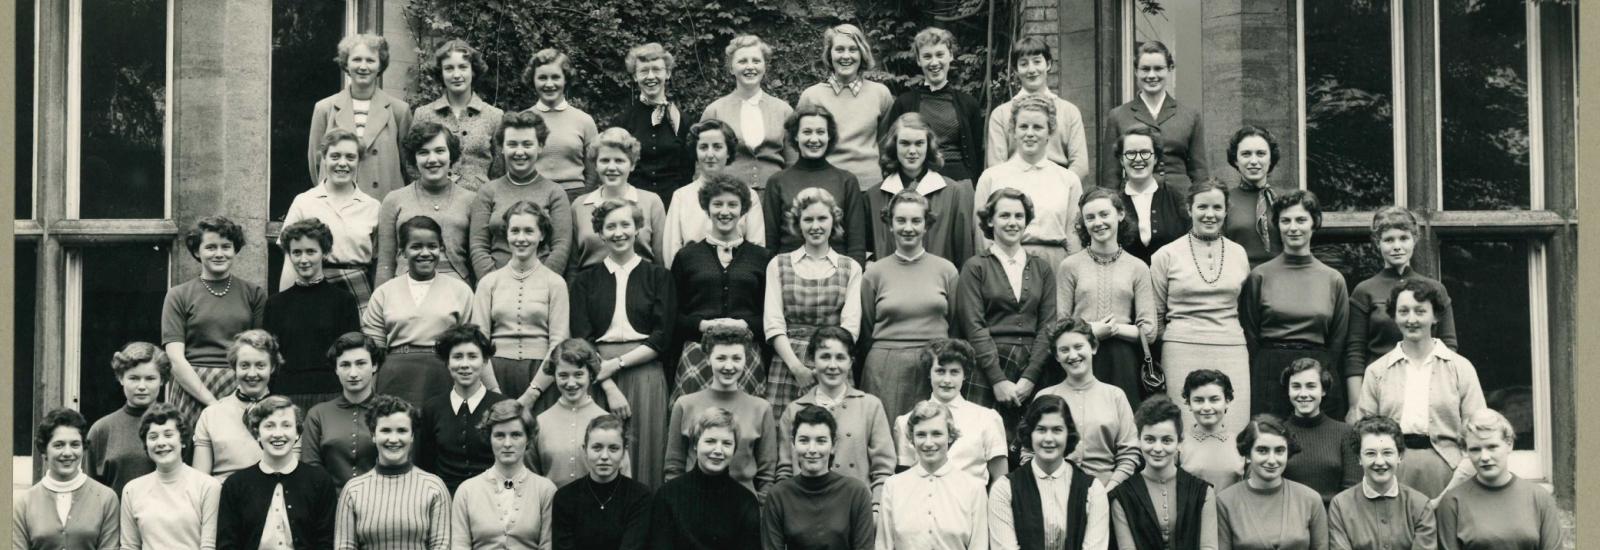 St Hilda's 1955 matriculation photograph